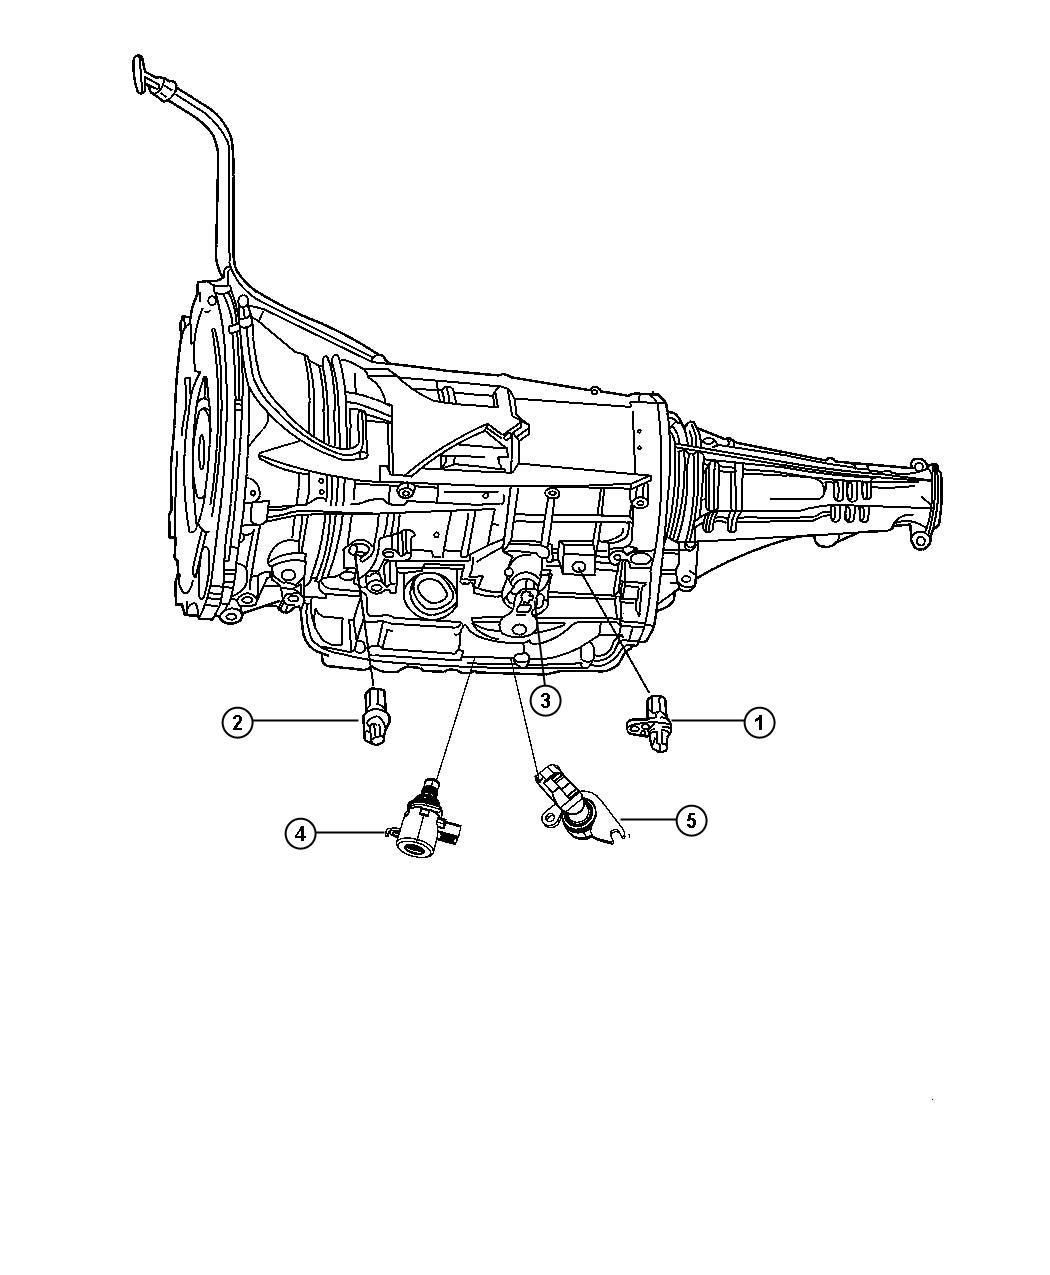 Jeep Liberty Sensor. Manual valve lever. Trans range